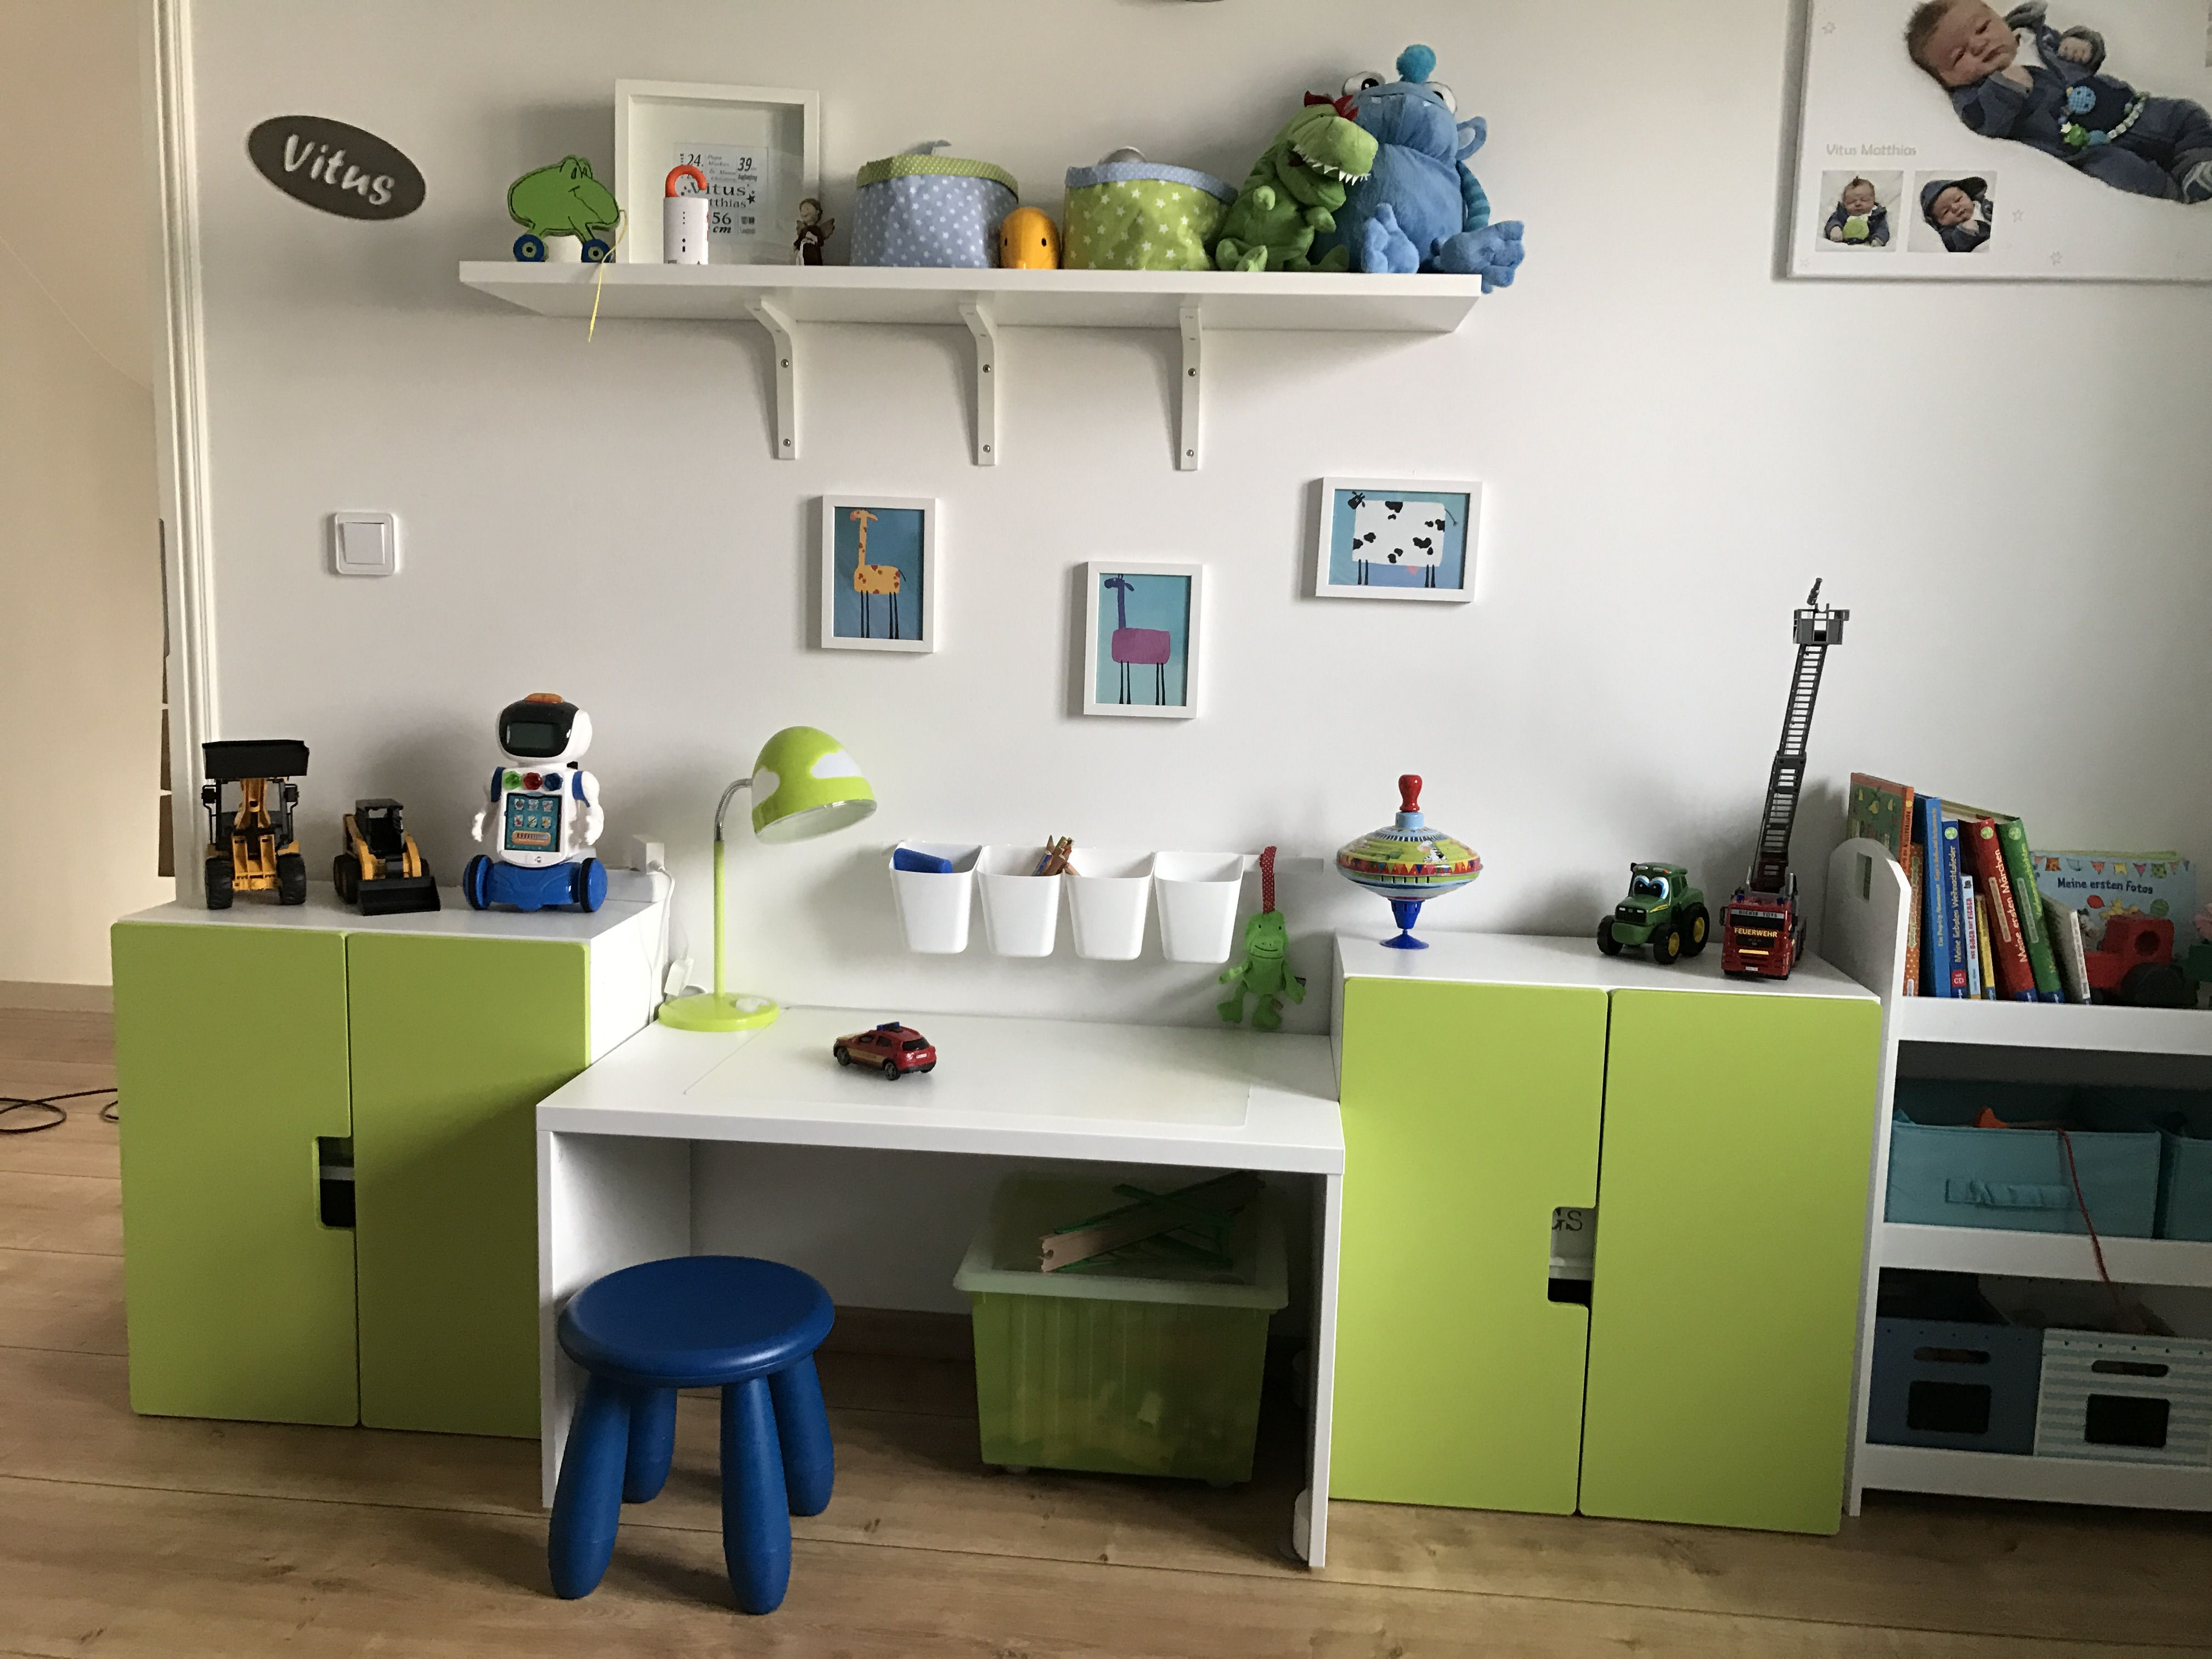 Stuva Kinderzimmer ~ Boys working place ikea stuva kinderzimmer jungs